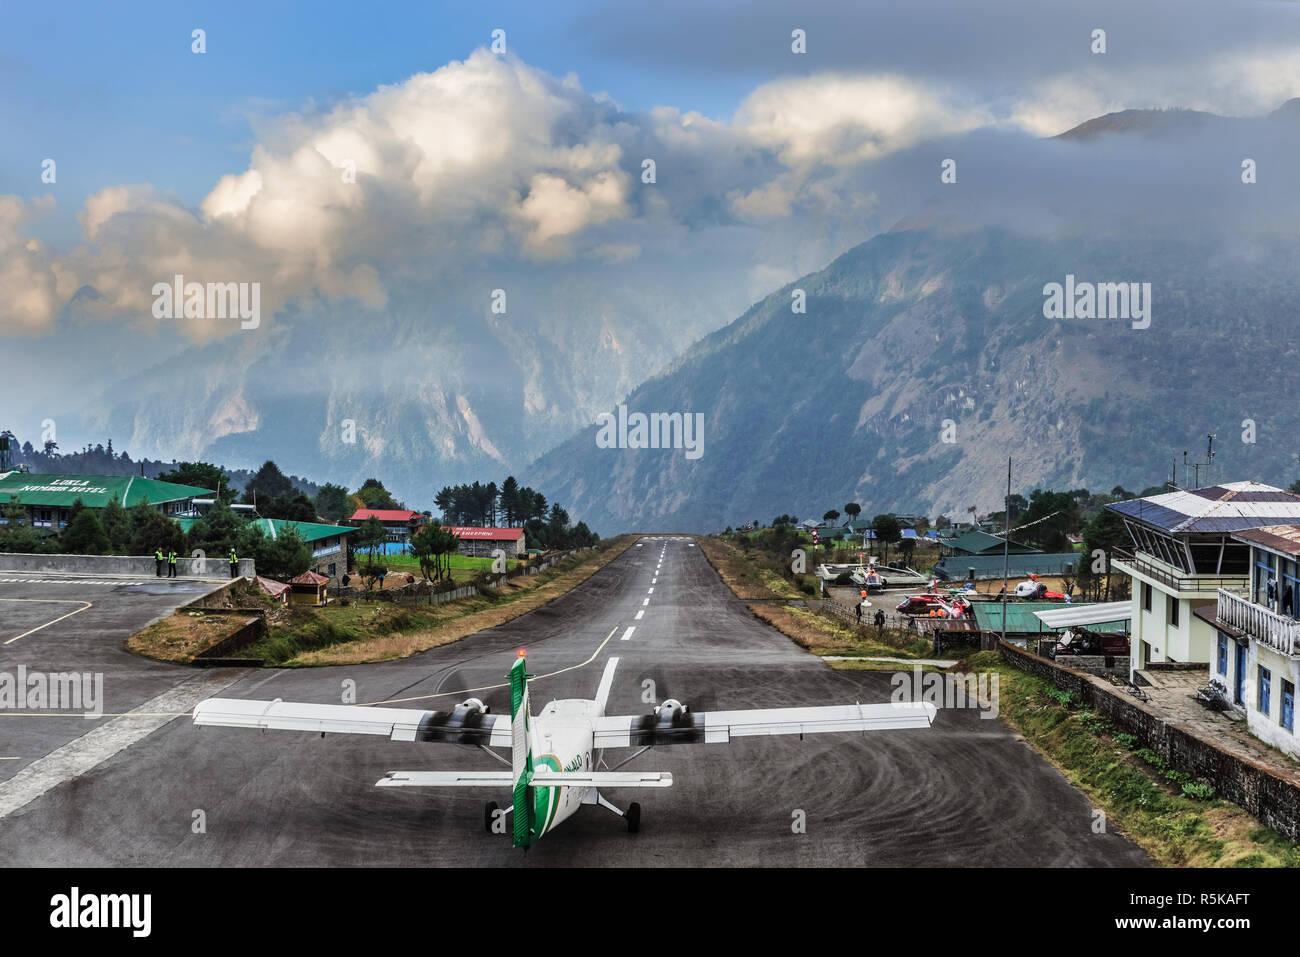 Lukla, Nepal - Nov 5, 2018: Plane is taking off from Hillary - Tenzing airport 500m runway in Lukla, Nepal. - Stock Image